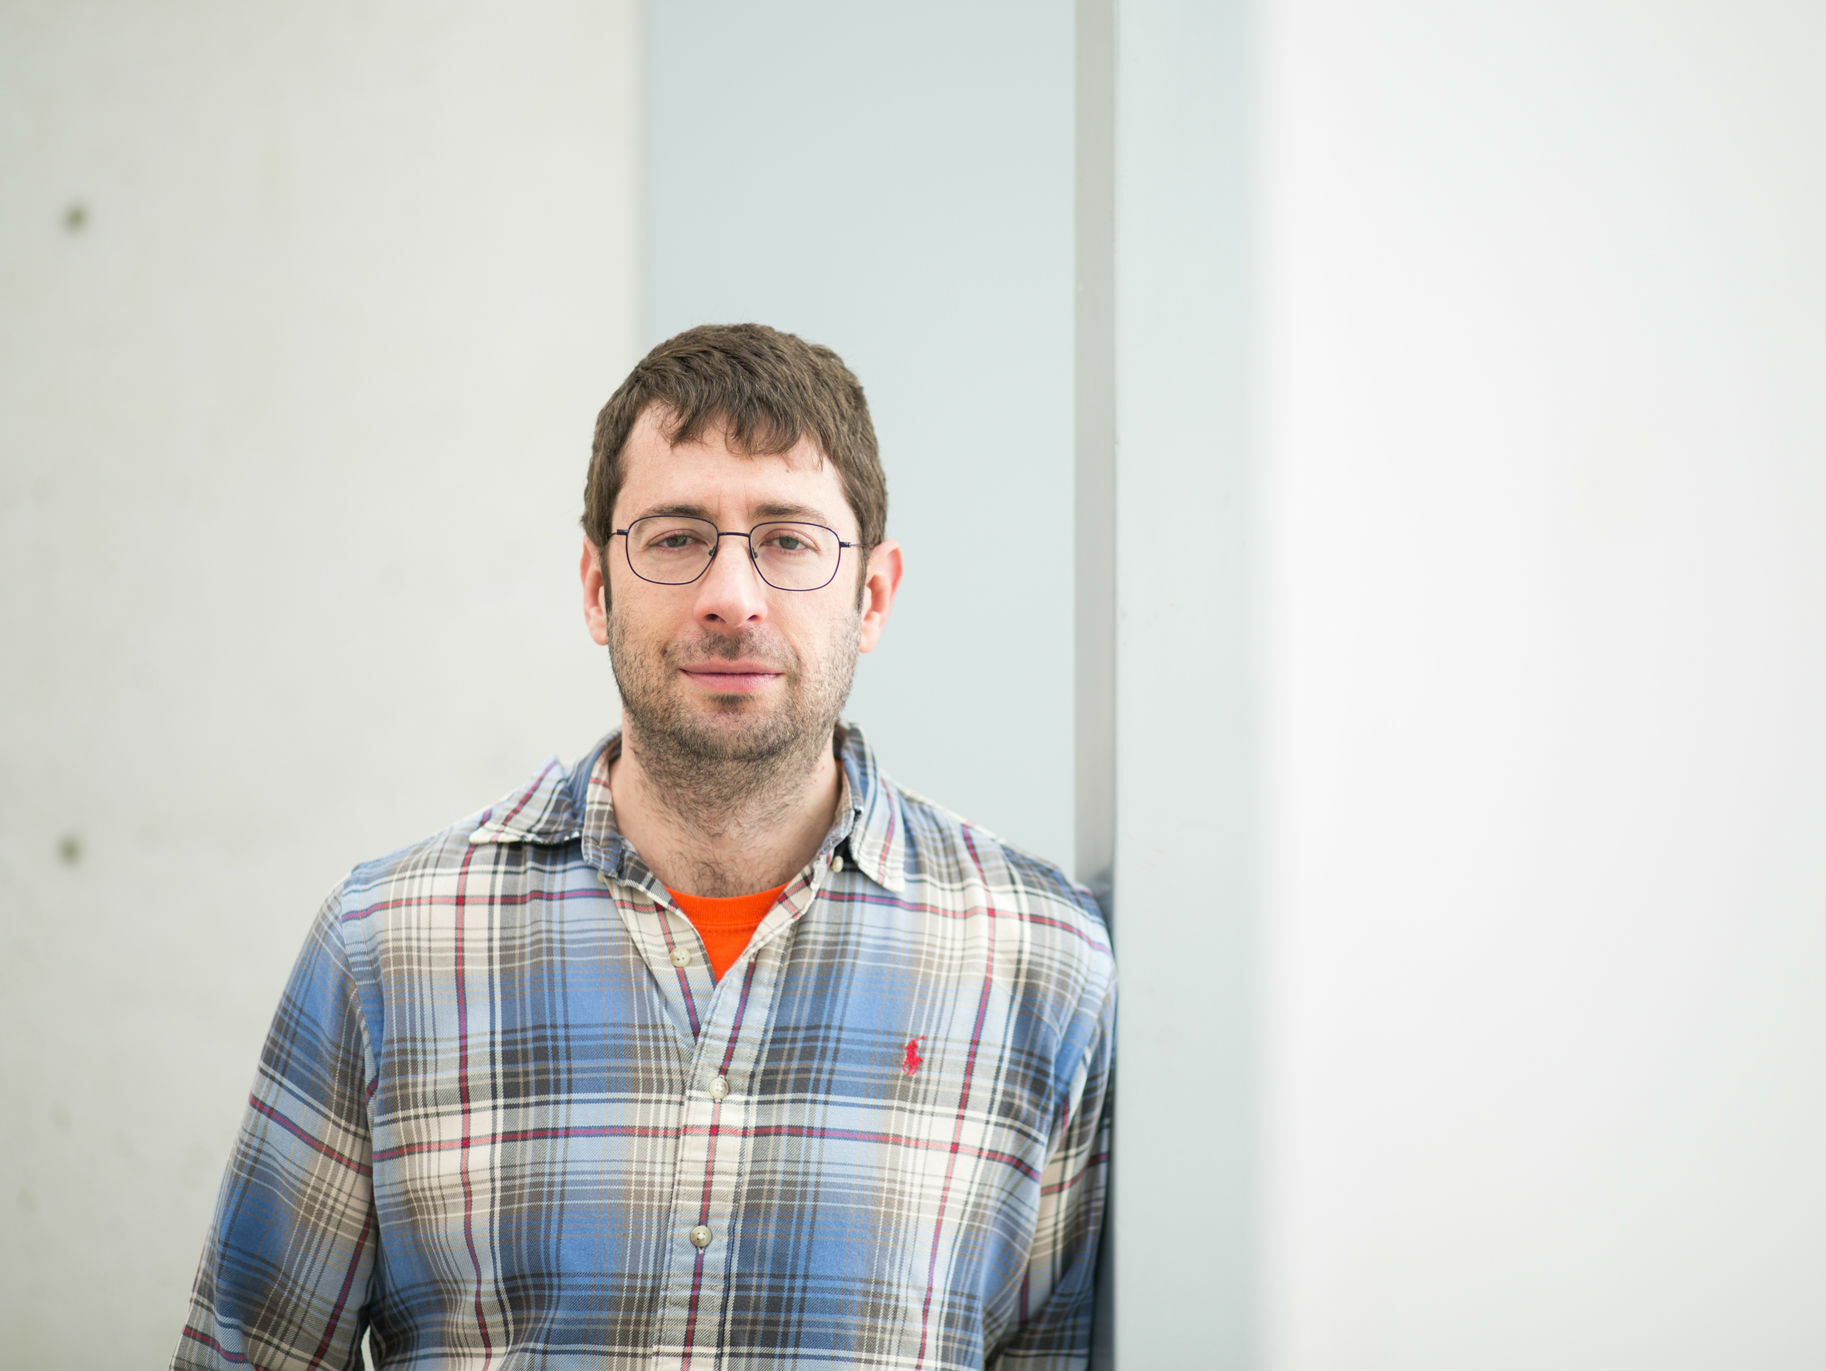 Michel Lipkes Leduc, el director artístico de FICUNAM